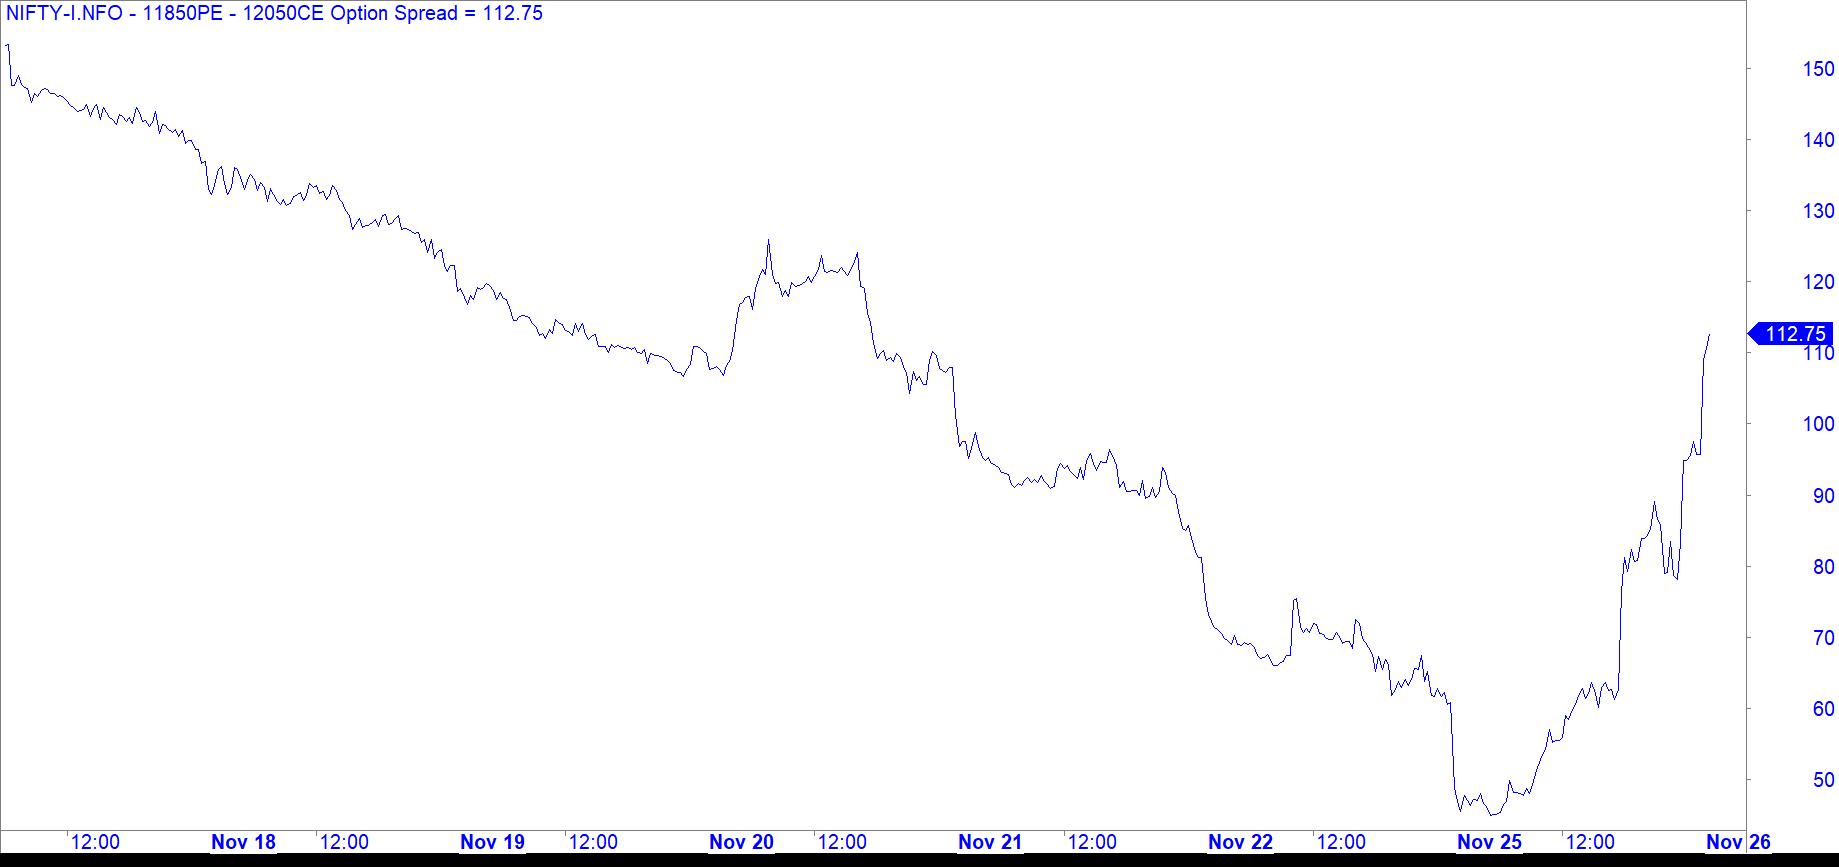 Nifty 11850PE - 12050CE Spread Chart